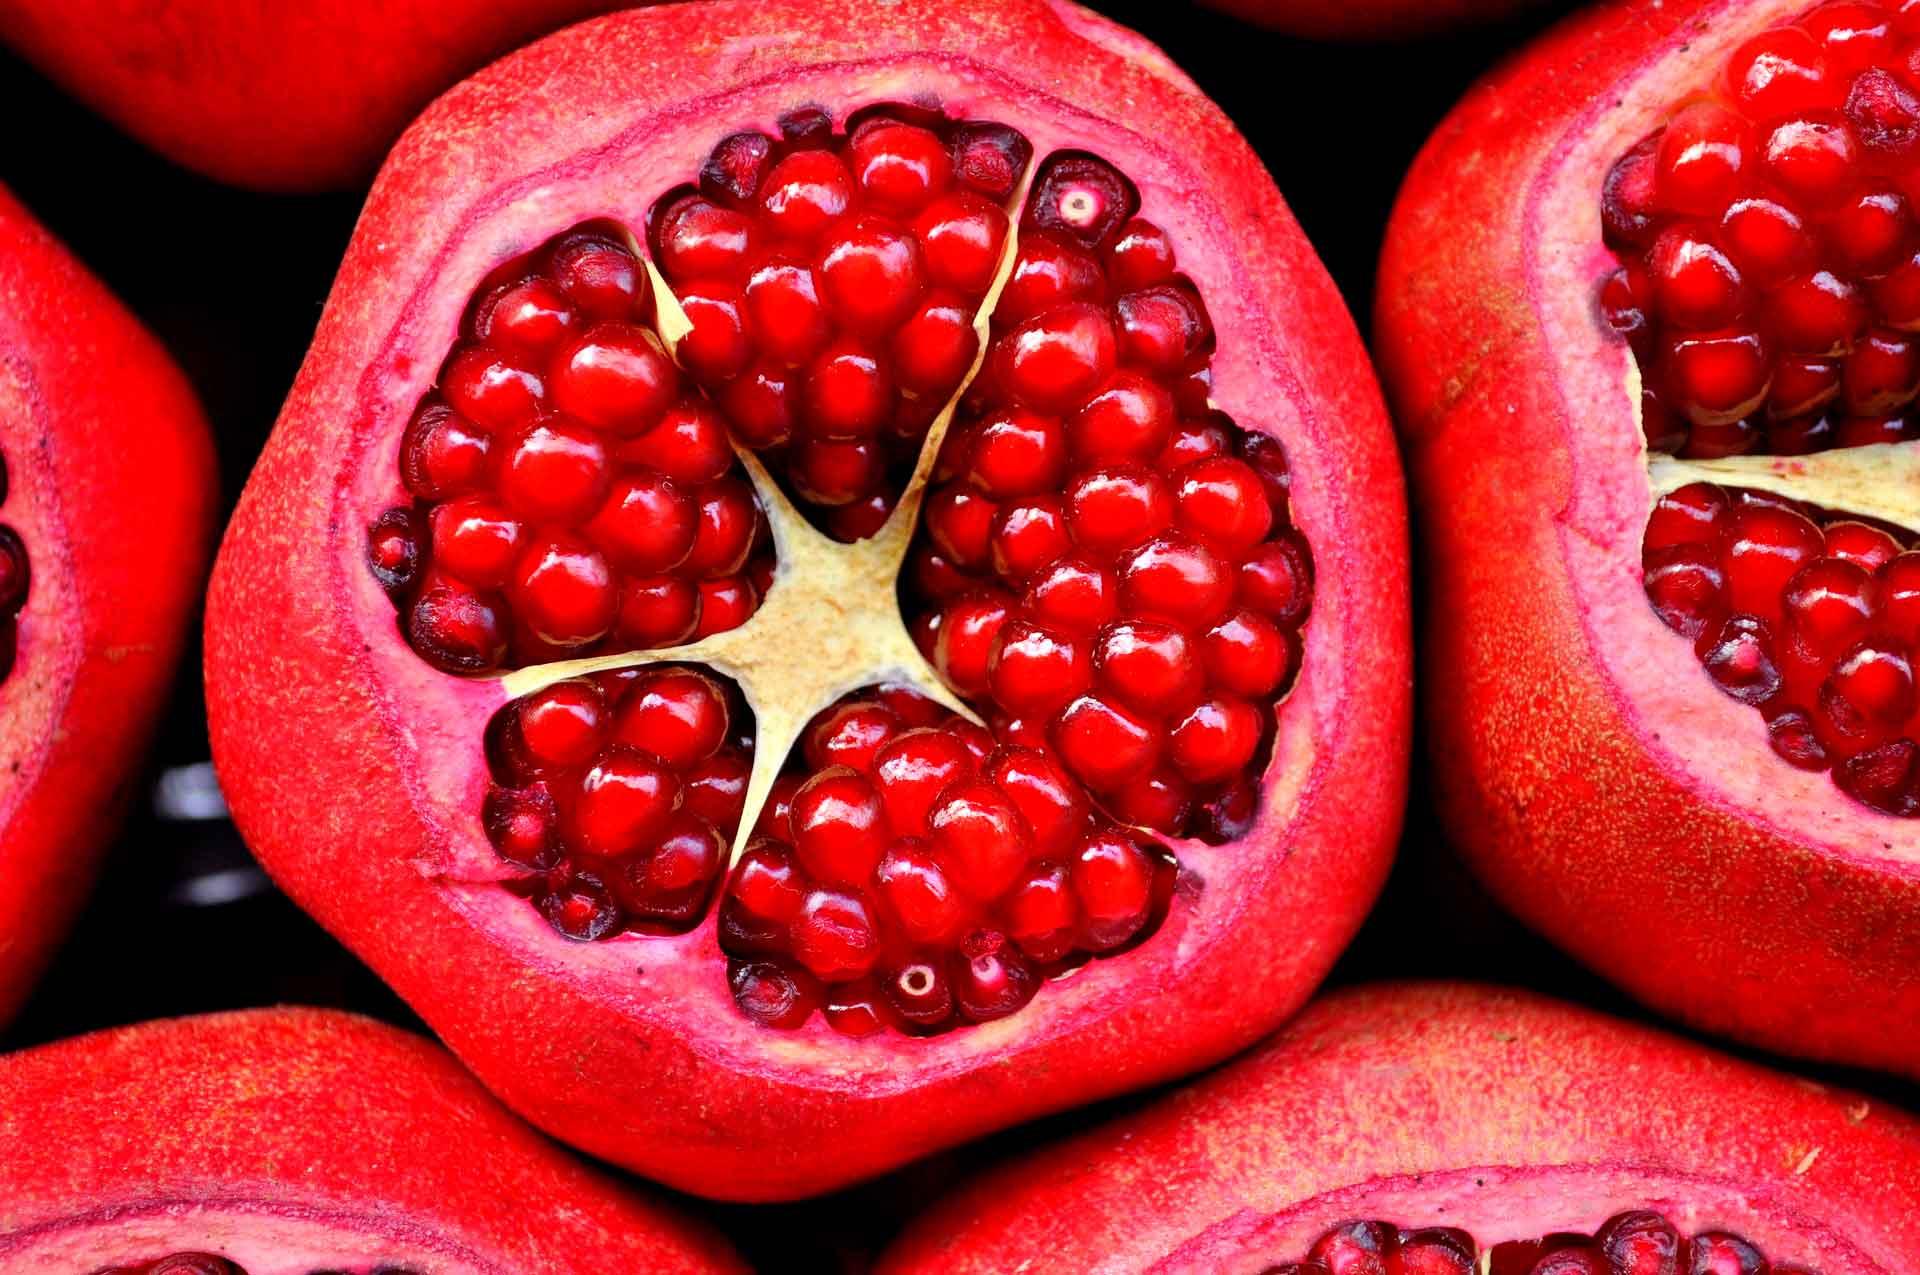 afrodisiacos pomegranate